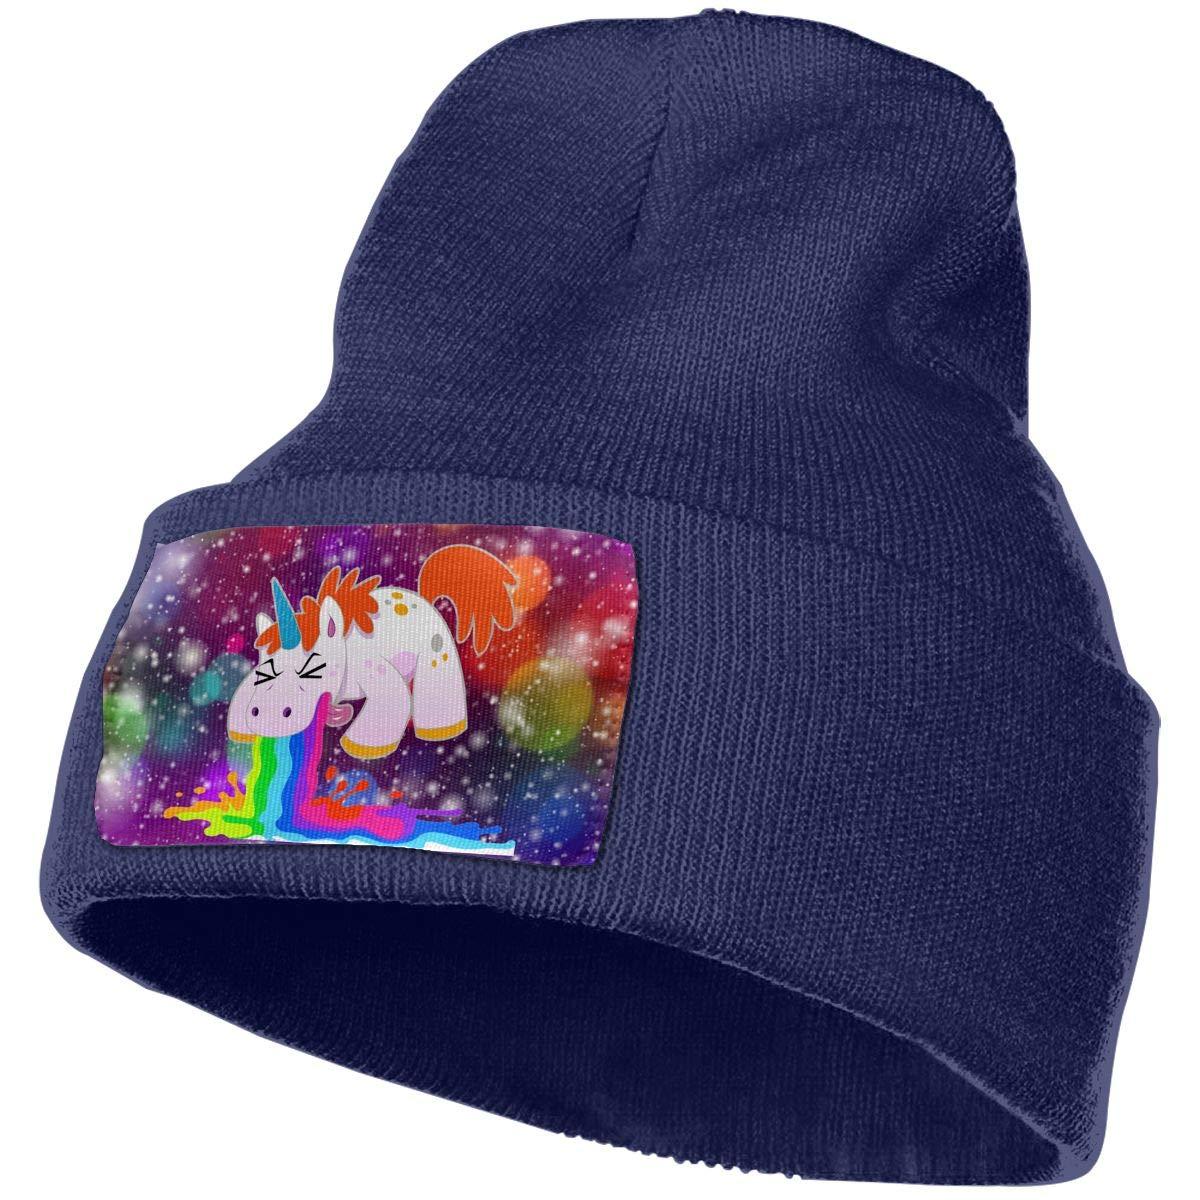 Unicorn I Puke Rainbows Men/&Women Warm Winter Knit Plain Beanie Hat Skull Cap Acrylic Knit Cuff Hat